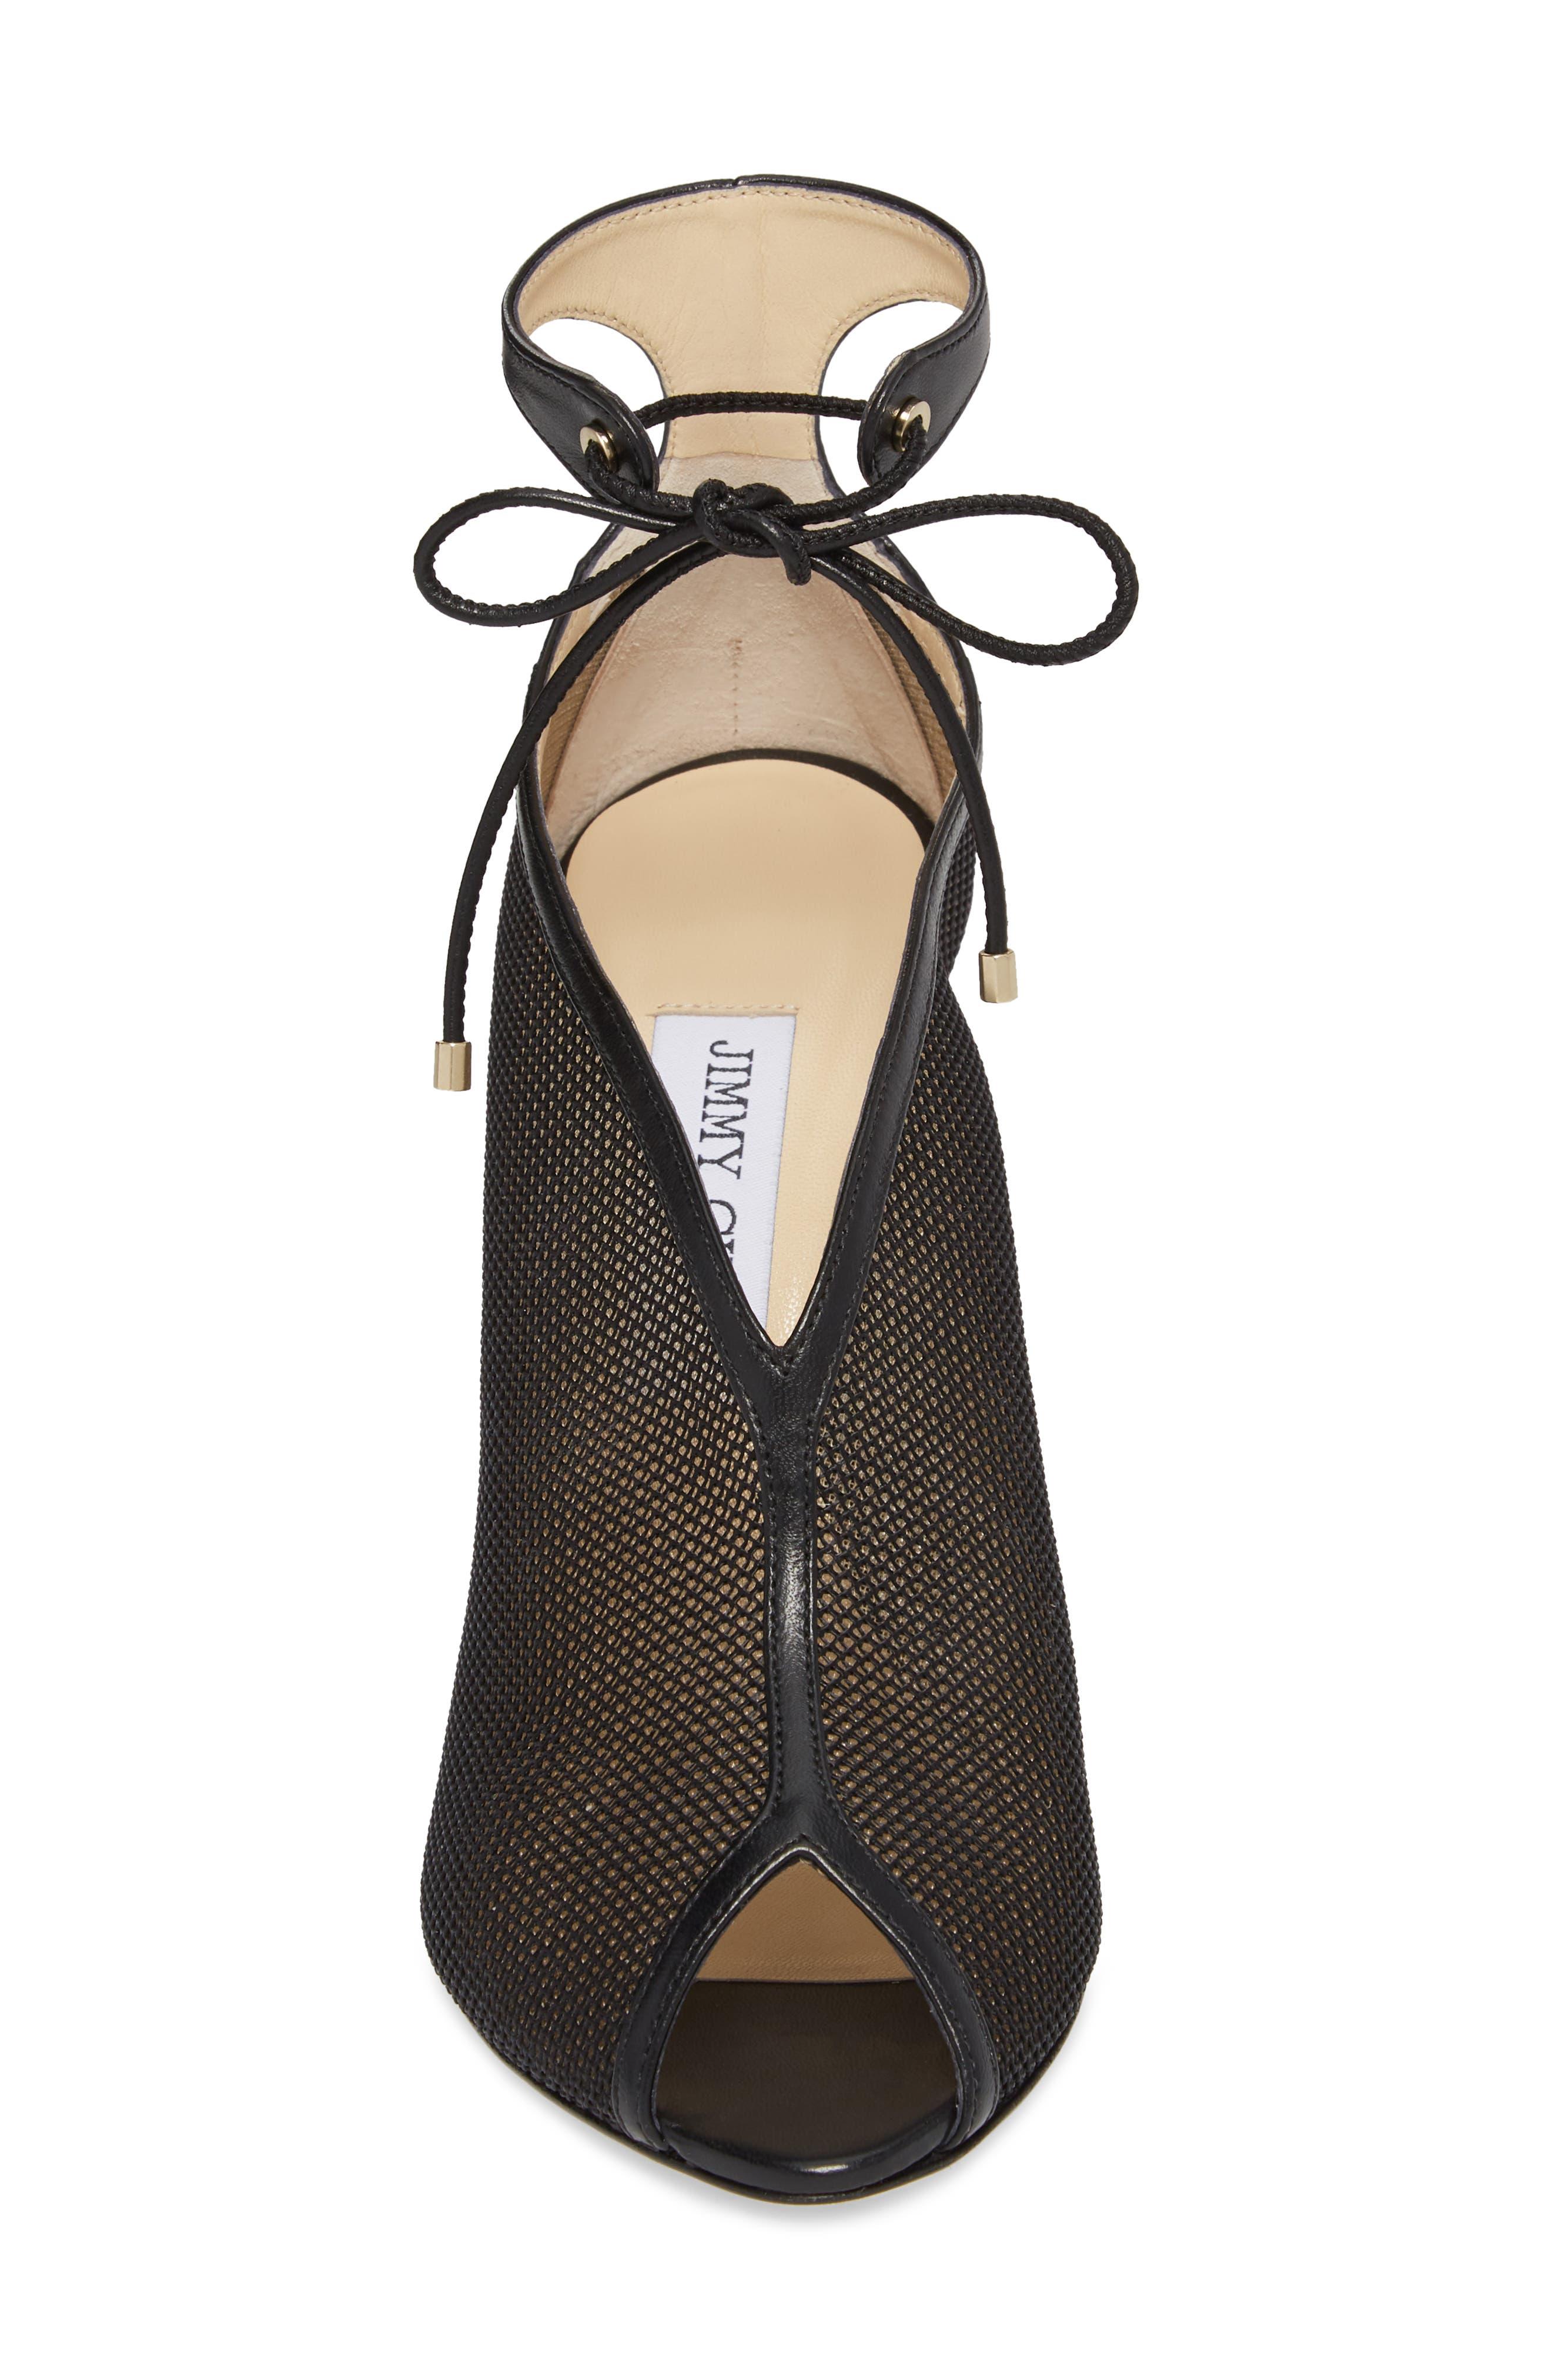 Sayra Ankle Tie Bootie,                             Alternate thumbnail 4, color,                             Black